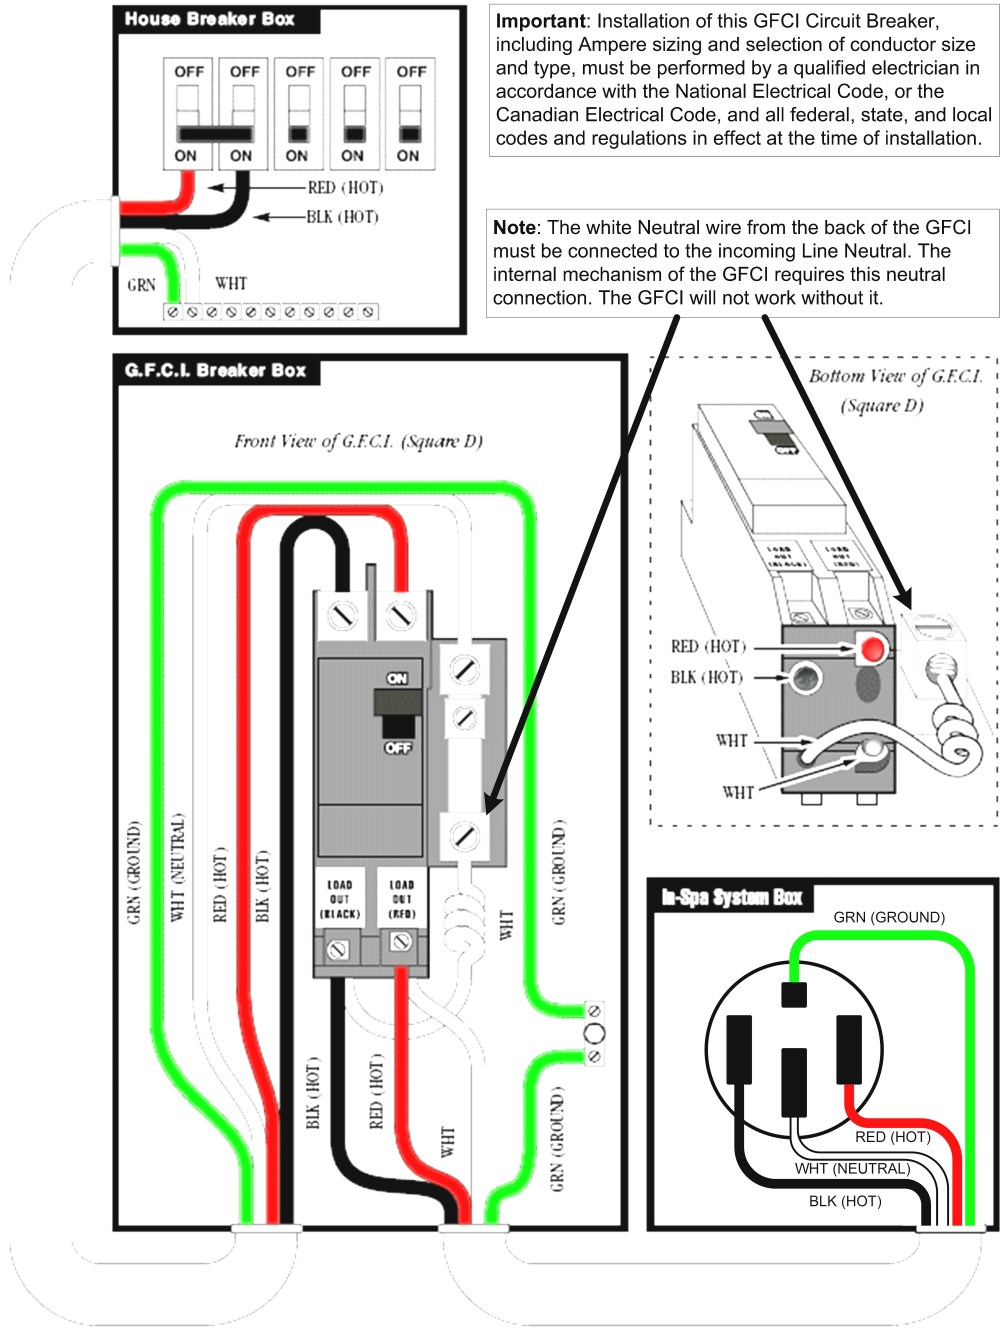 medium resolution of gfci breaker wiring diagram elegant gfi troubleshooting gallery free rh thespartanchronicle electric breaker box wiring diagram 240v plug